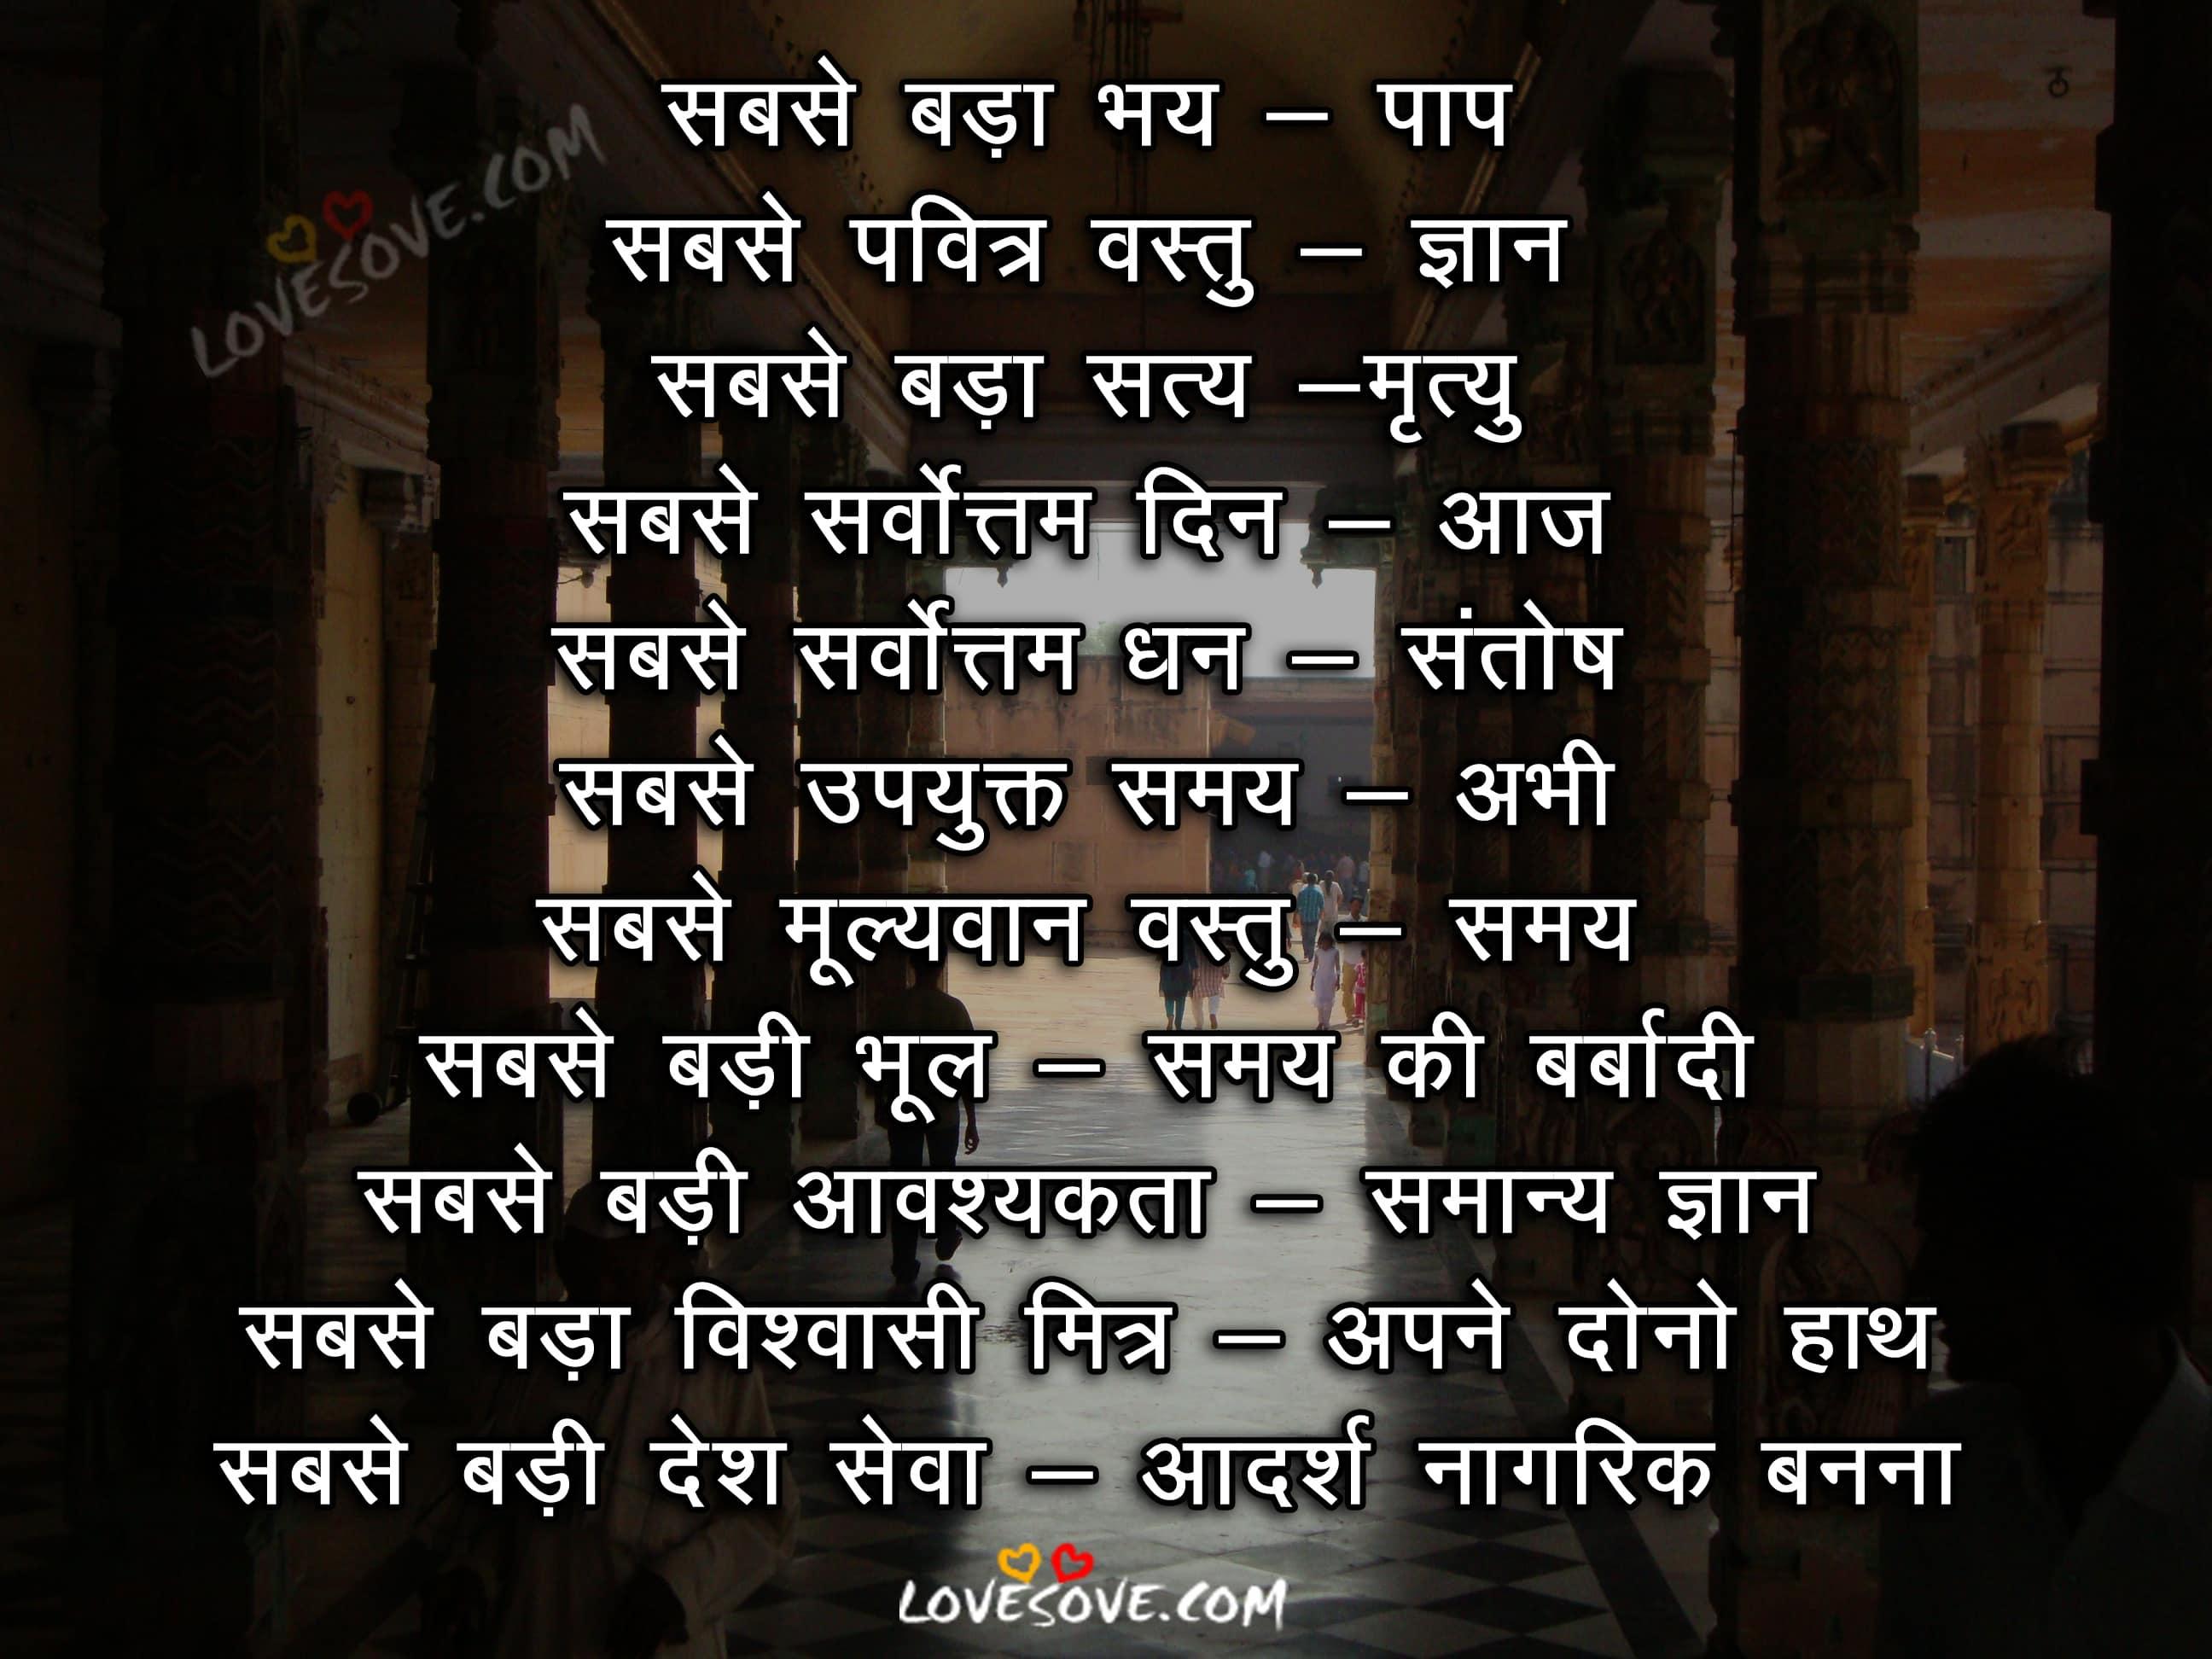 hindi suvichar image, हिंदी सुविचार वालपेपर, सबसे बड़ा भय - पाप - Hindi Suvichar Quote With Image, anmol suvichar image